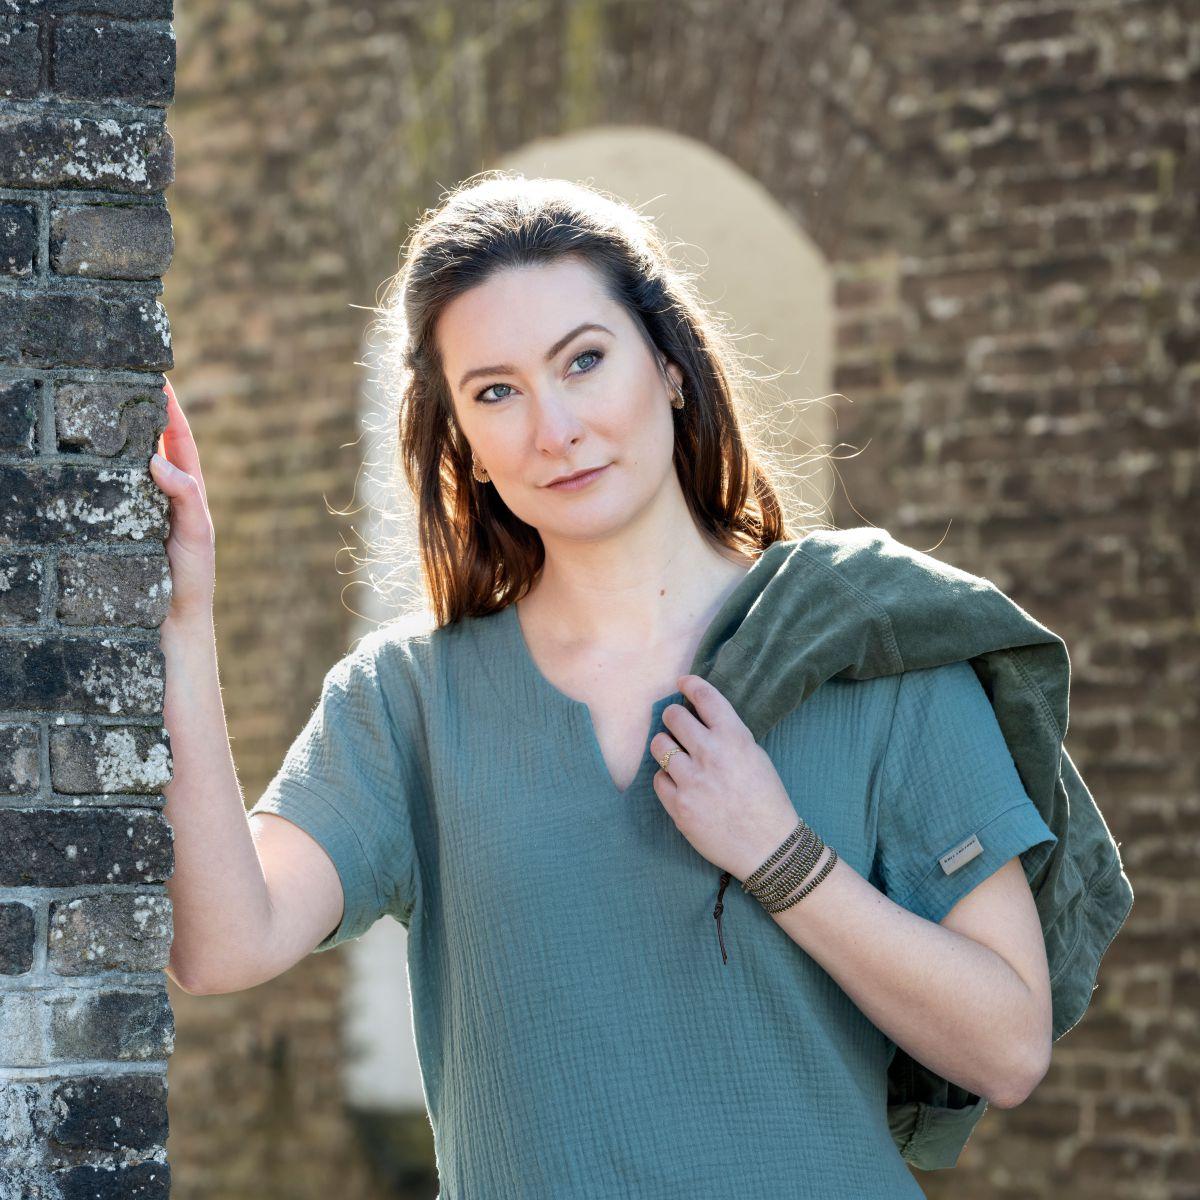 knit factory kf15012000950 indy jurk stone green m 3